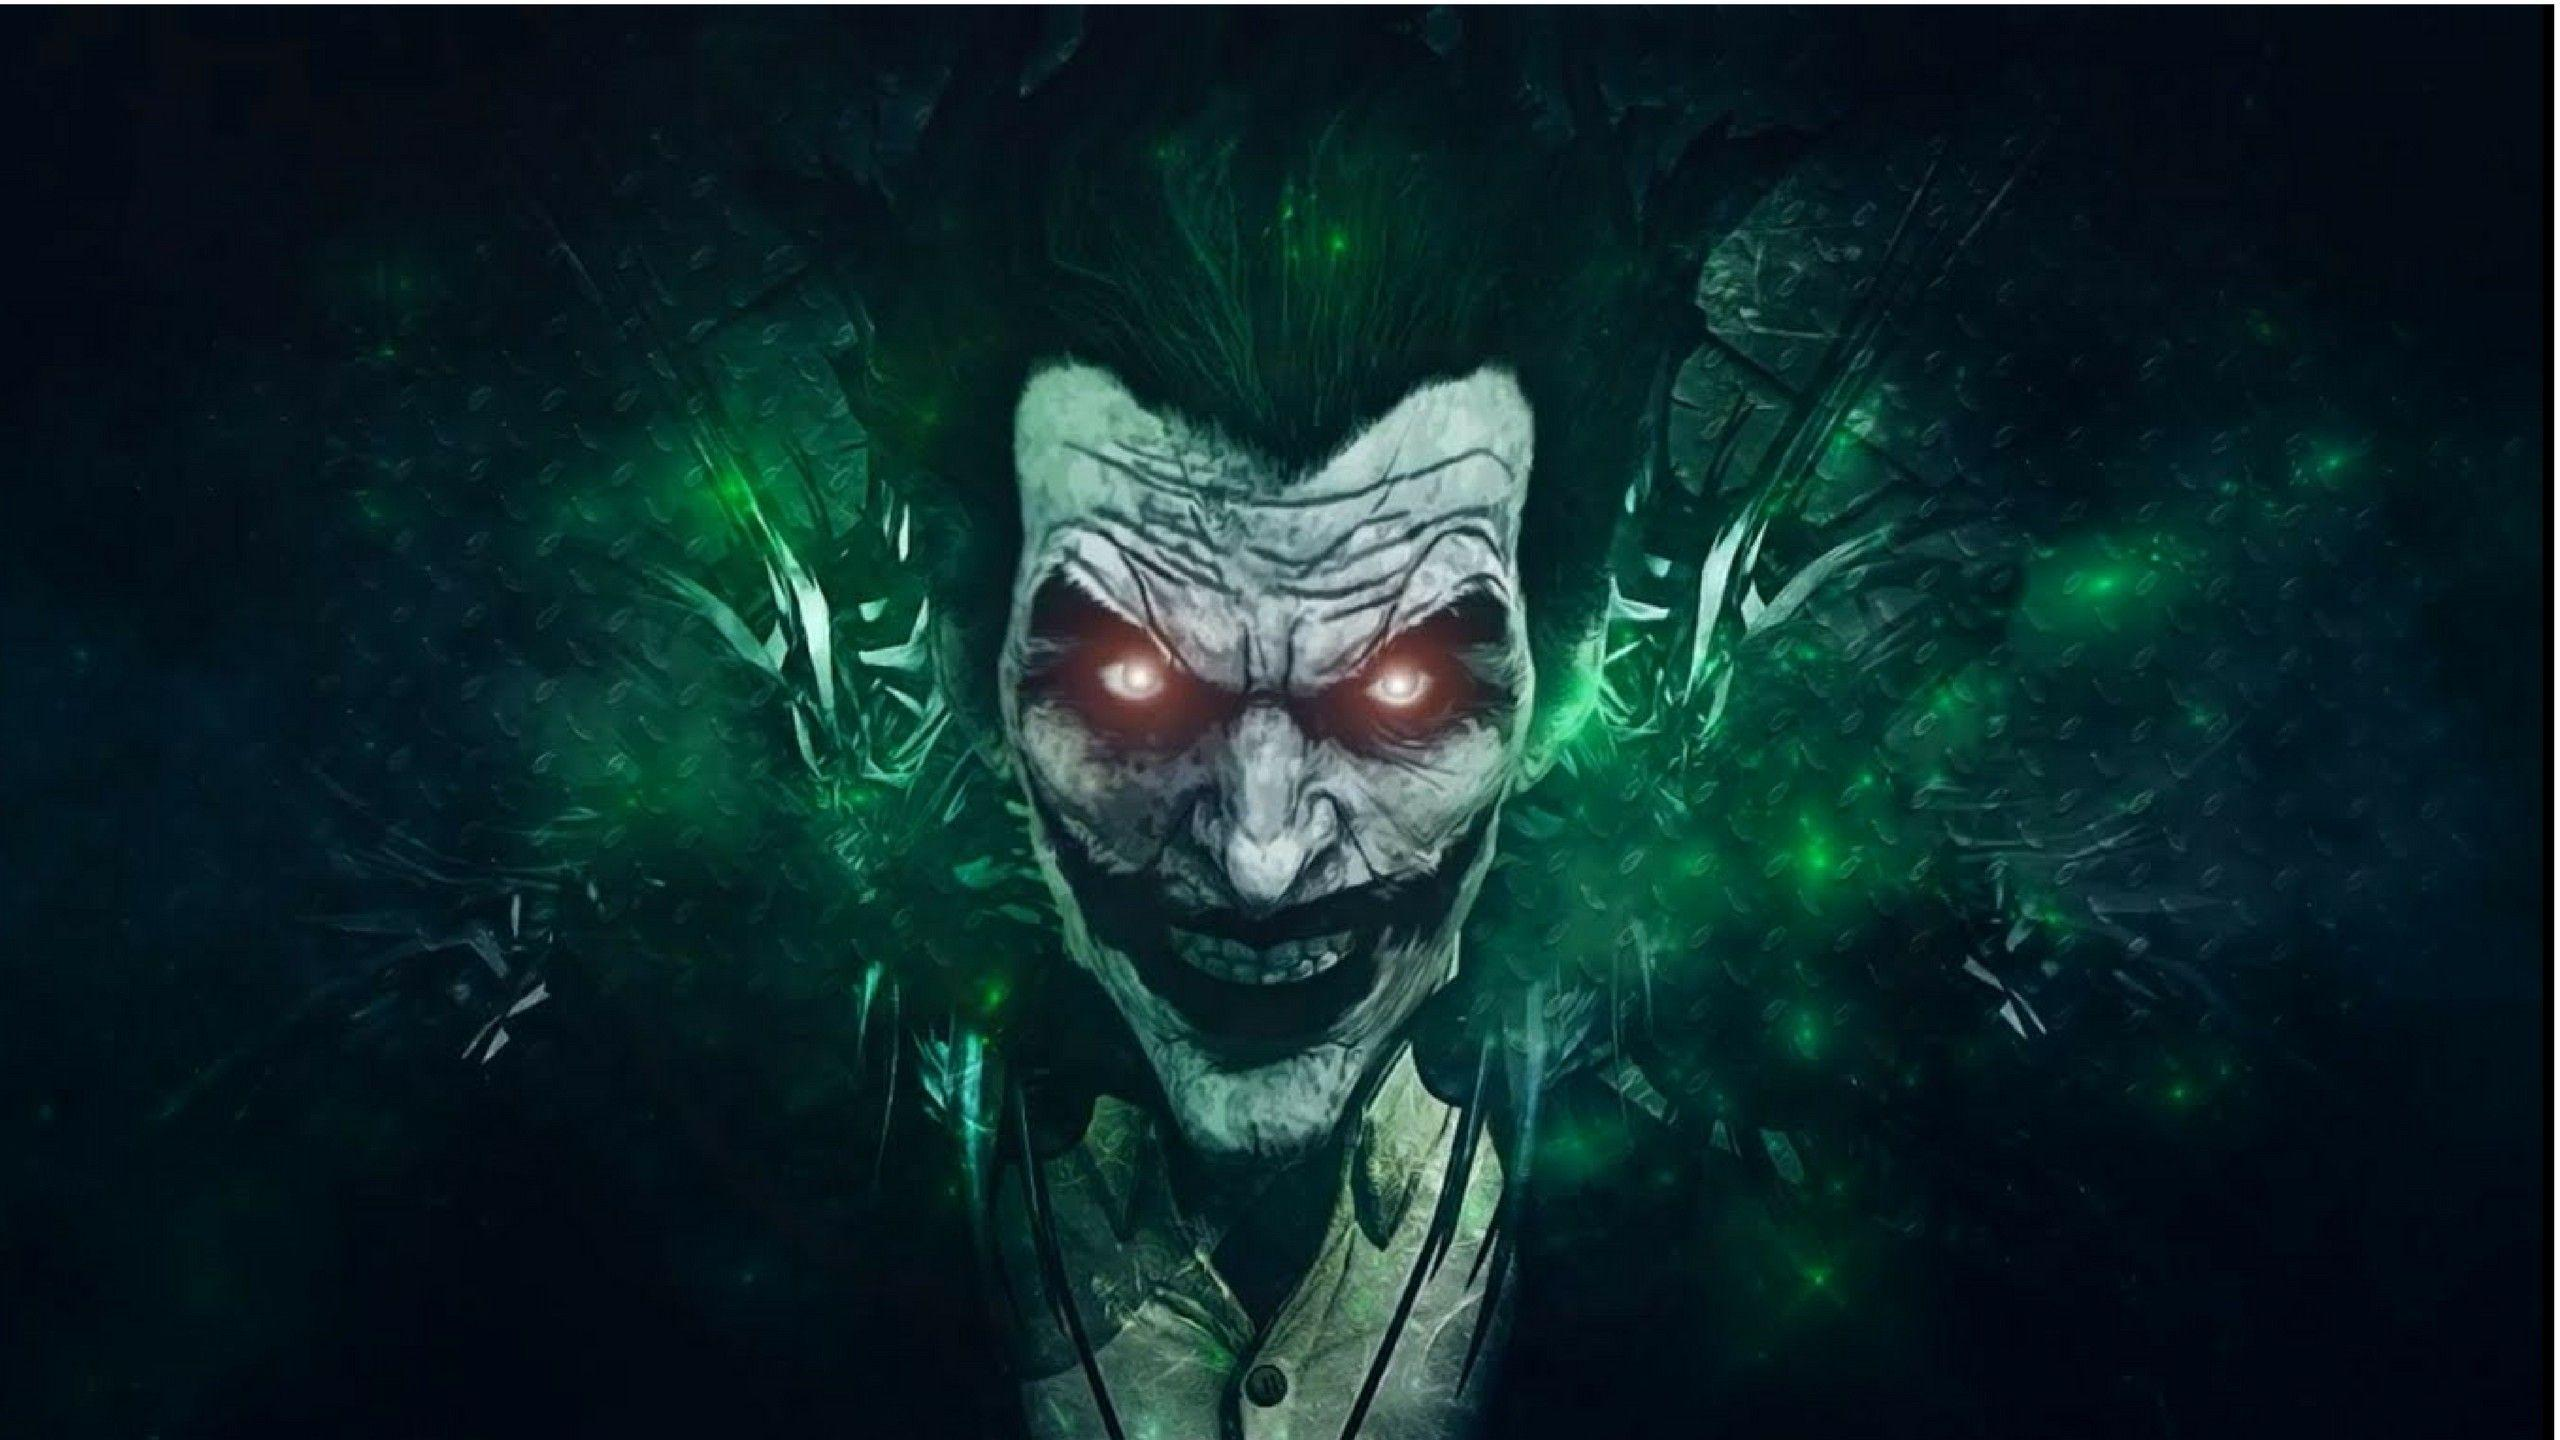 Joker Live Wallpapers Wallpaper Cave